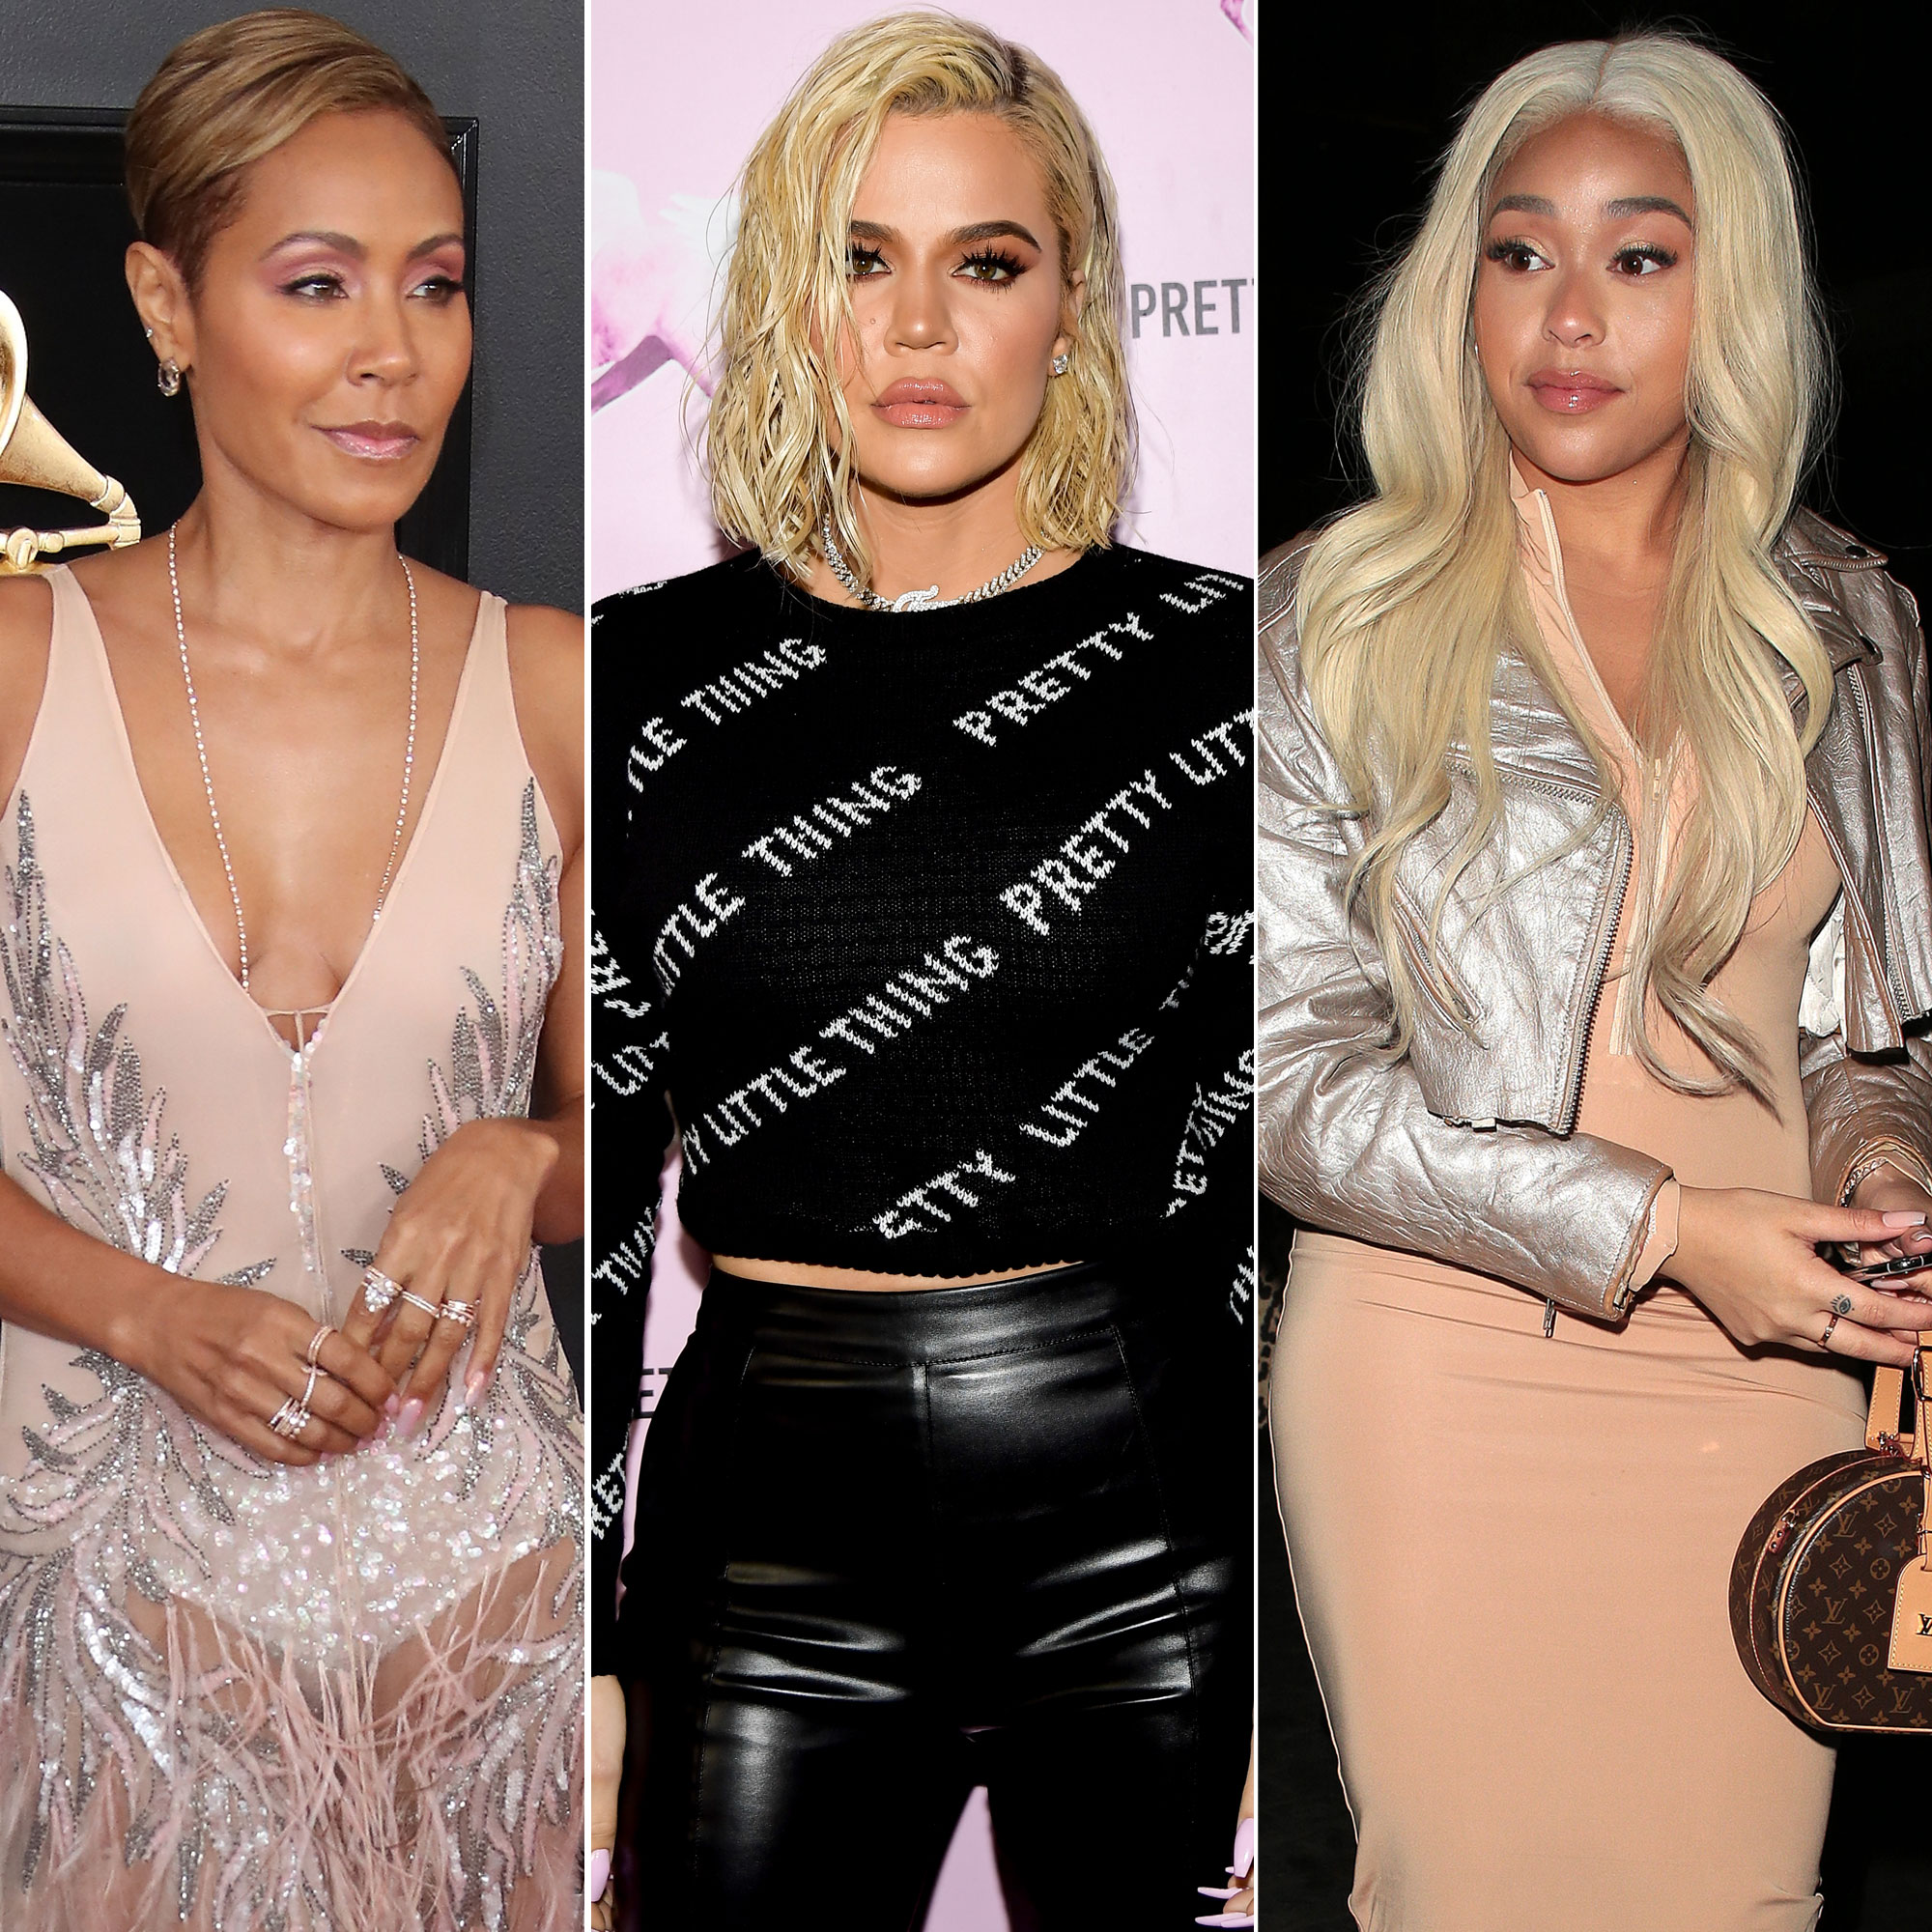 Jada Pinkett Smith Unfollows Khloe, Kris and Kim After Jordyn Woods Scandal - Jada Pinkett, Khloe Kardashian, Jordyn Woods